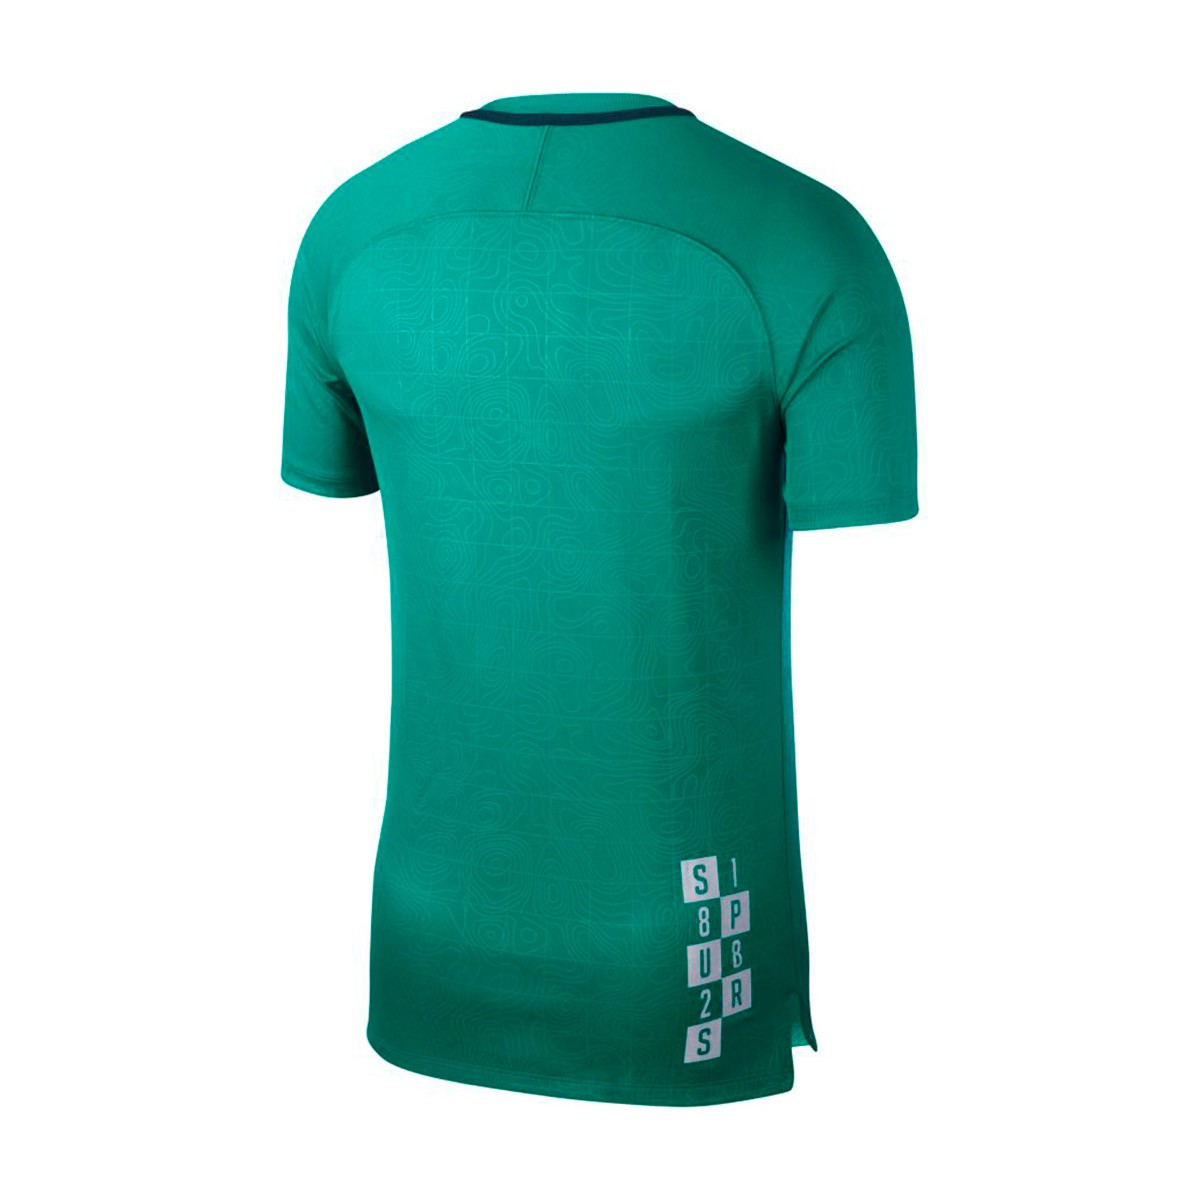 comprar camiseta Tottenham Hotspur deportivas